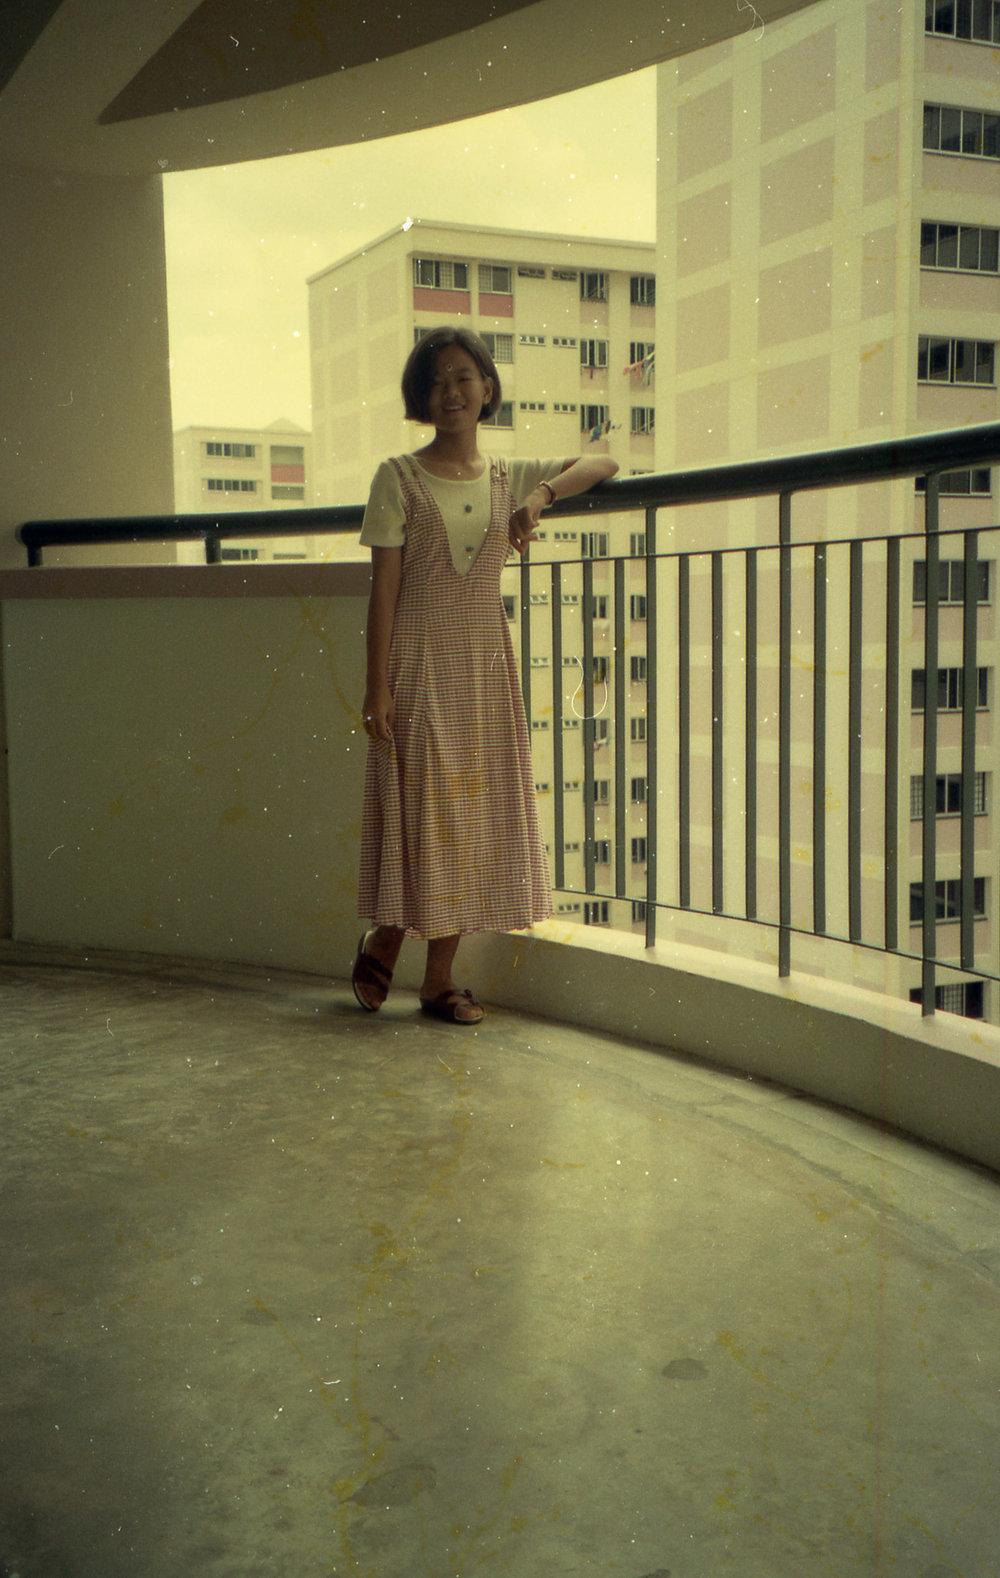 singapore-gurkhas-archive-photo-museum-zakaria-zainal-20.jpg